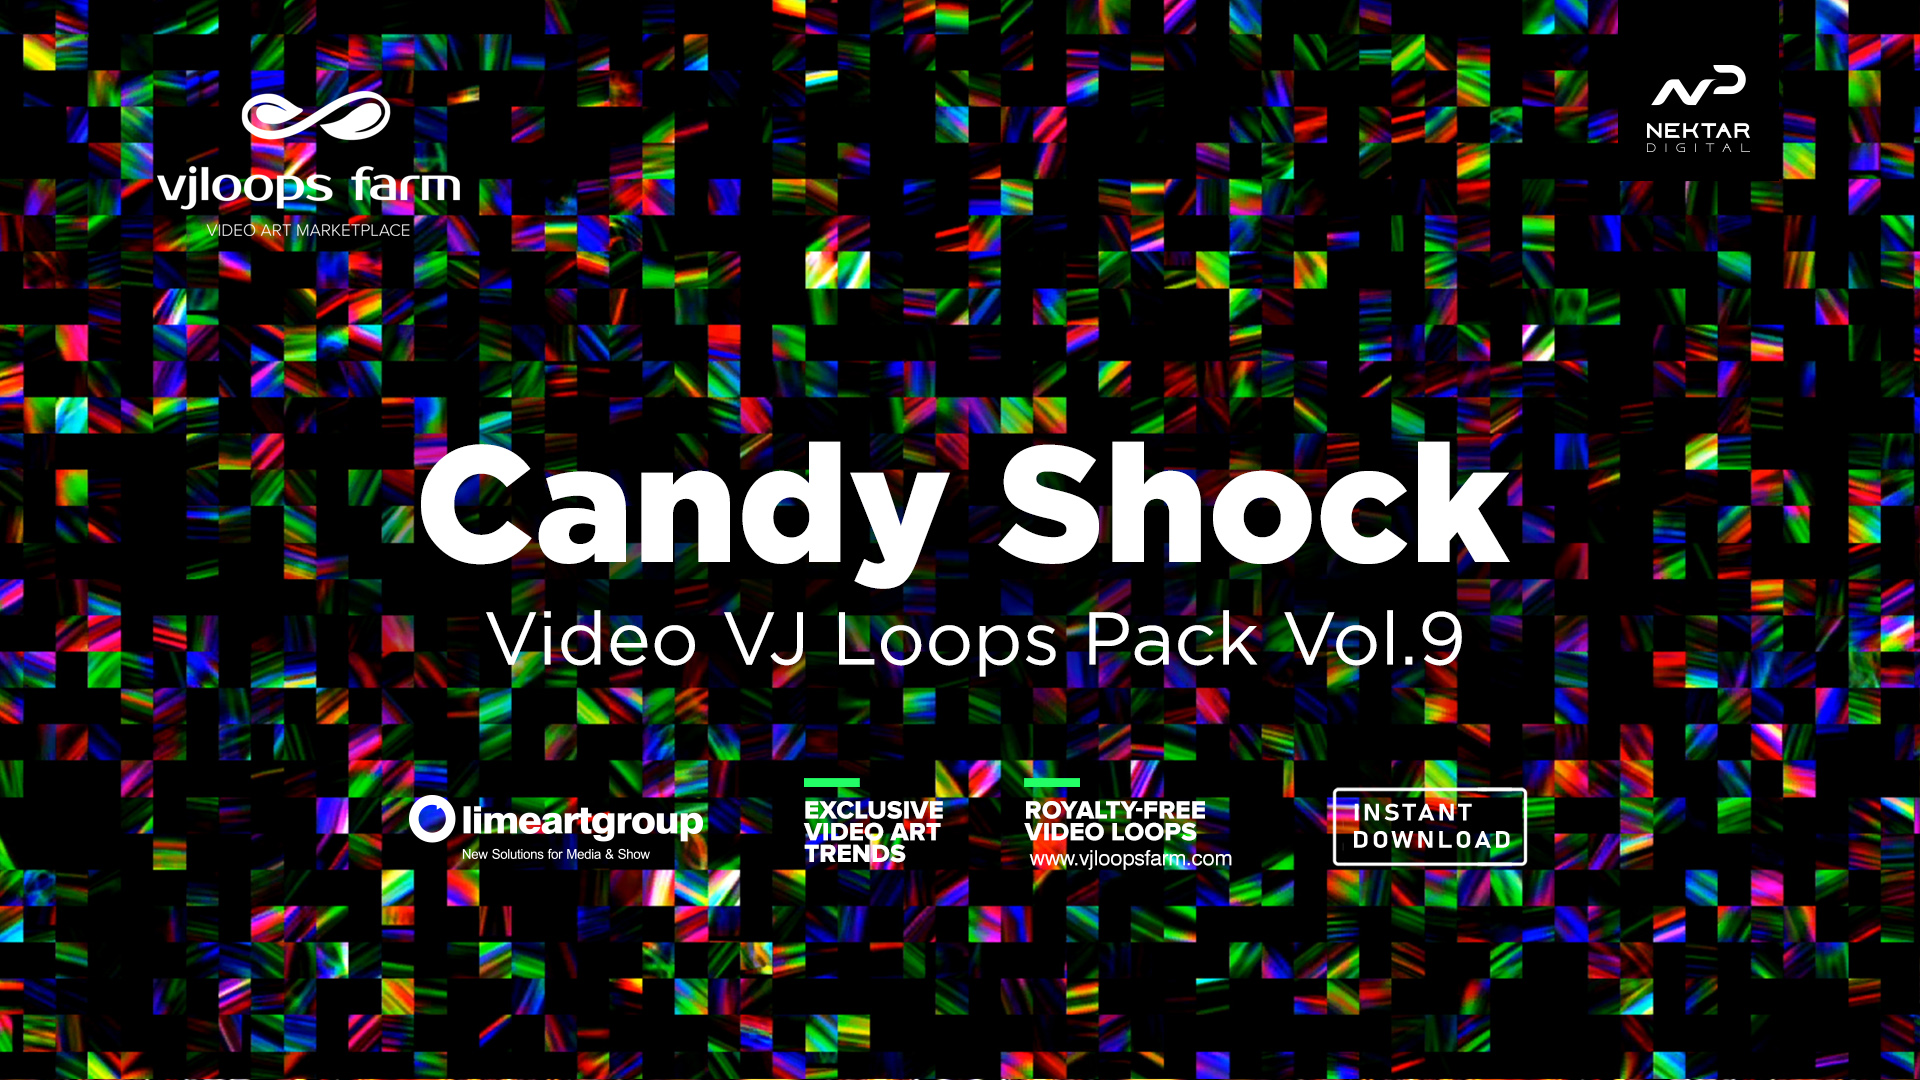 Candy Shock vj loops